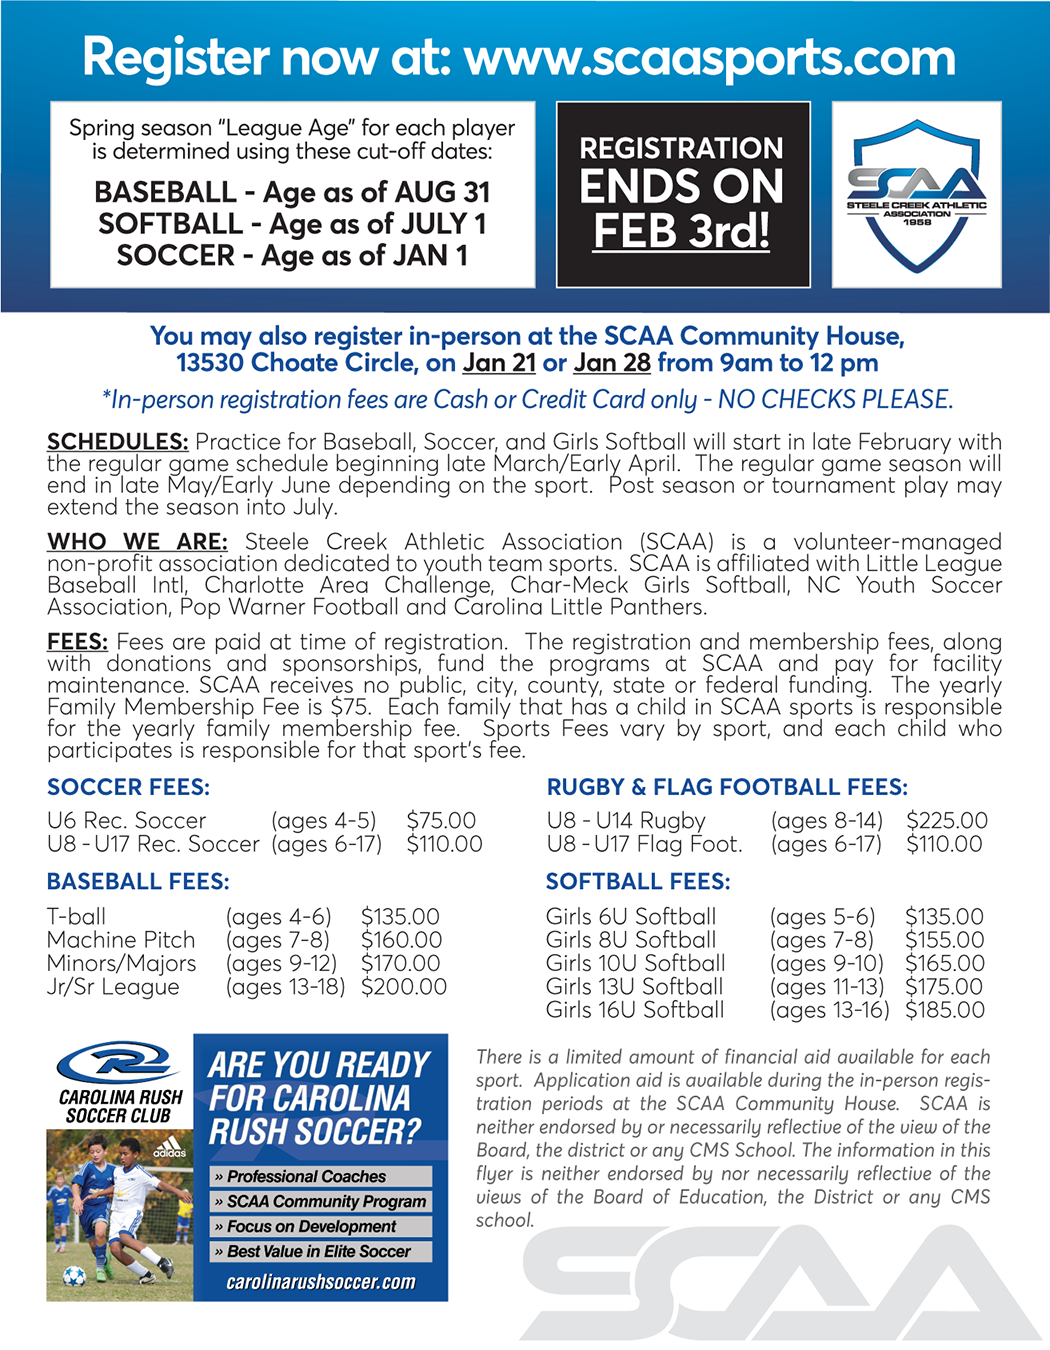 Steele Creek Athletic Association